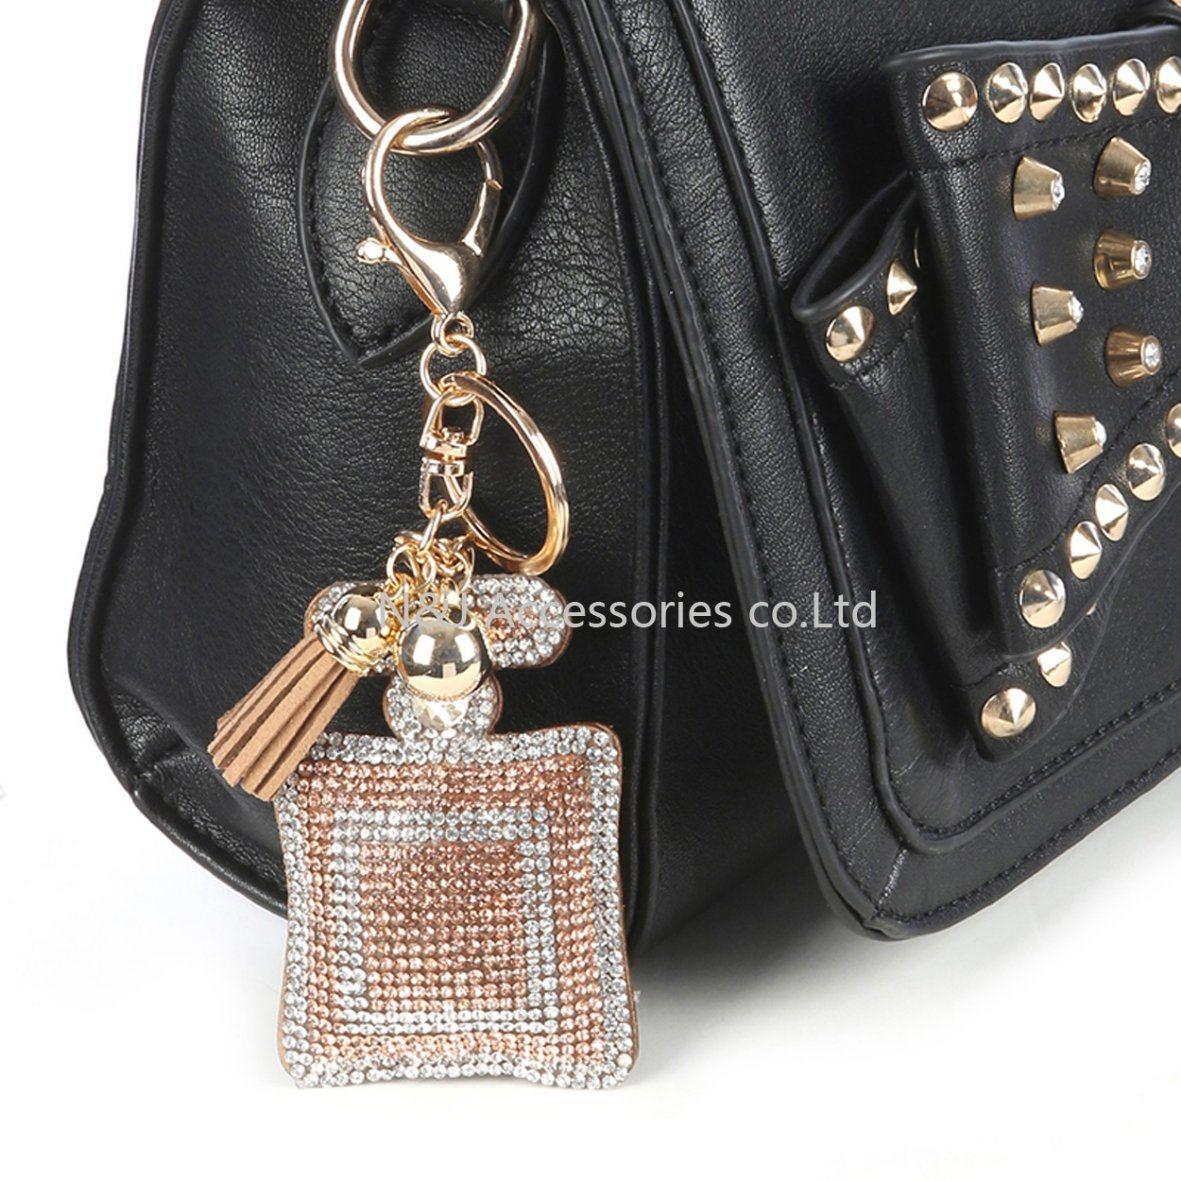 Fashion Jewellry Stuffed Pillow Perfume Bag Accessory Key Chain Ornament Gift